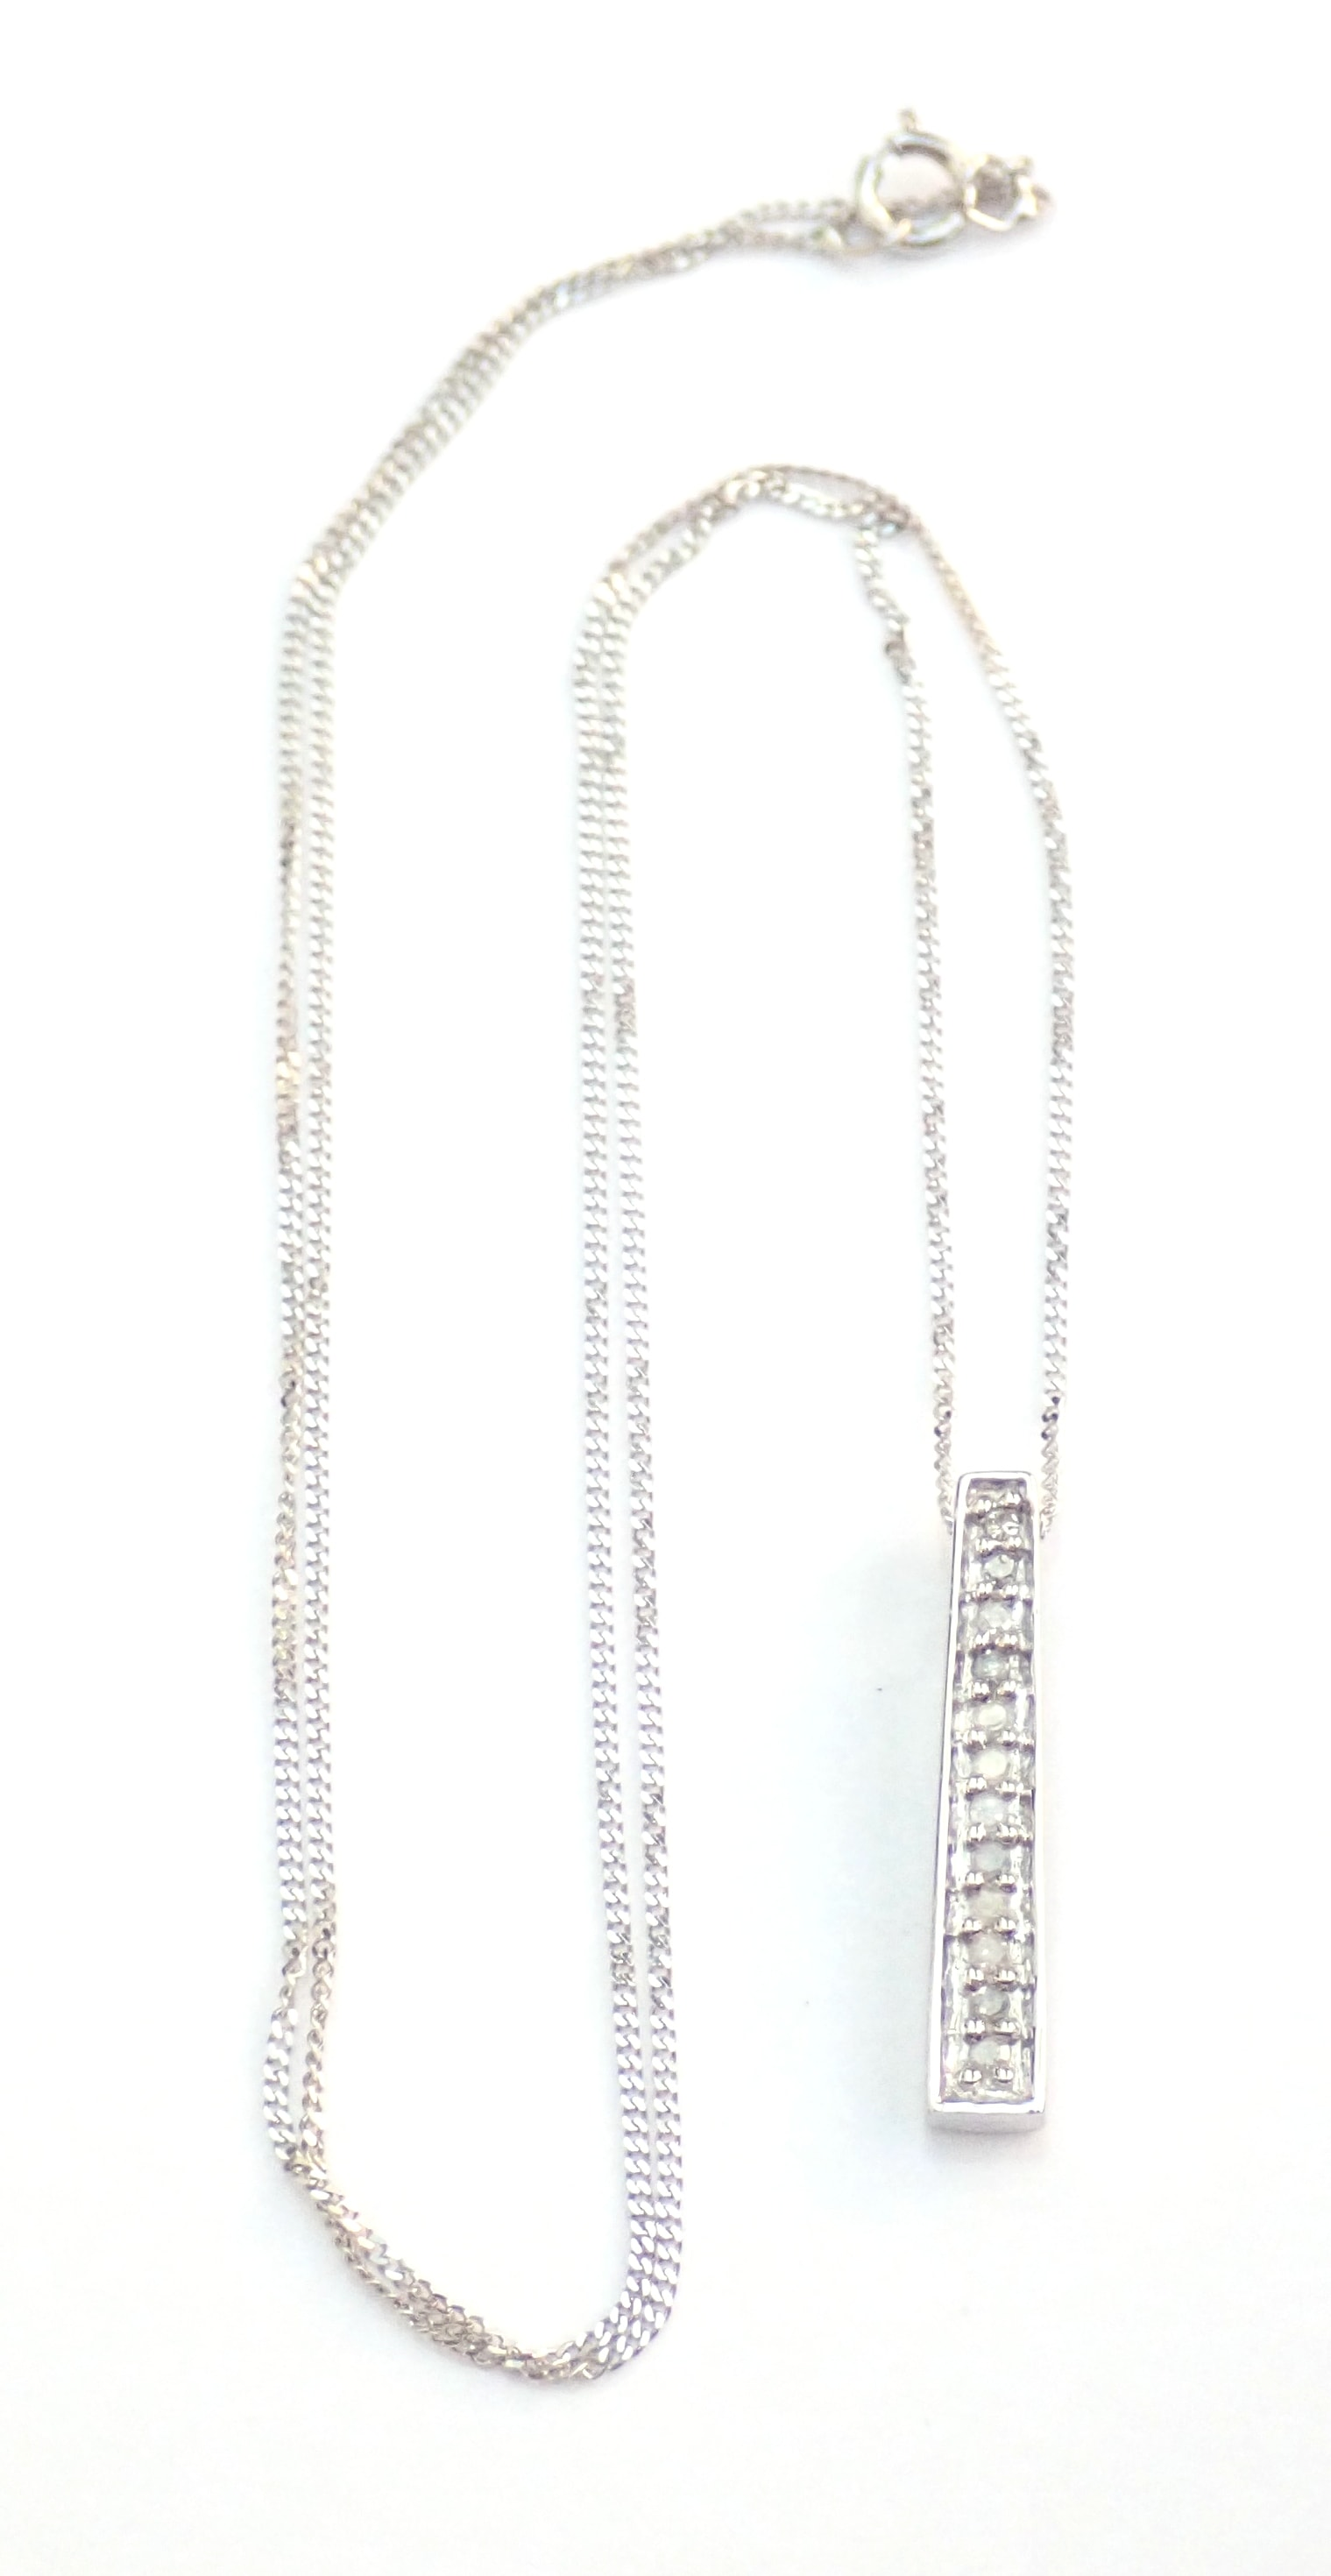 "AZZ00664 - Beautiful! Diamond Stick Pendant & 18"" Curb Chain 9 carat White Gold Fully Hallmarked #50"